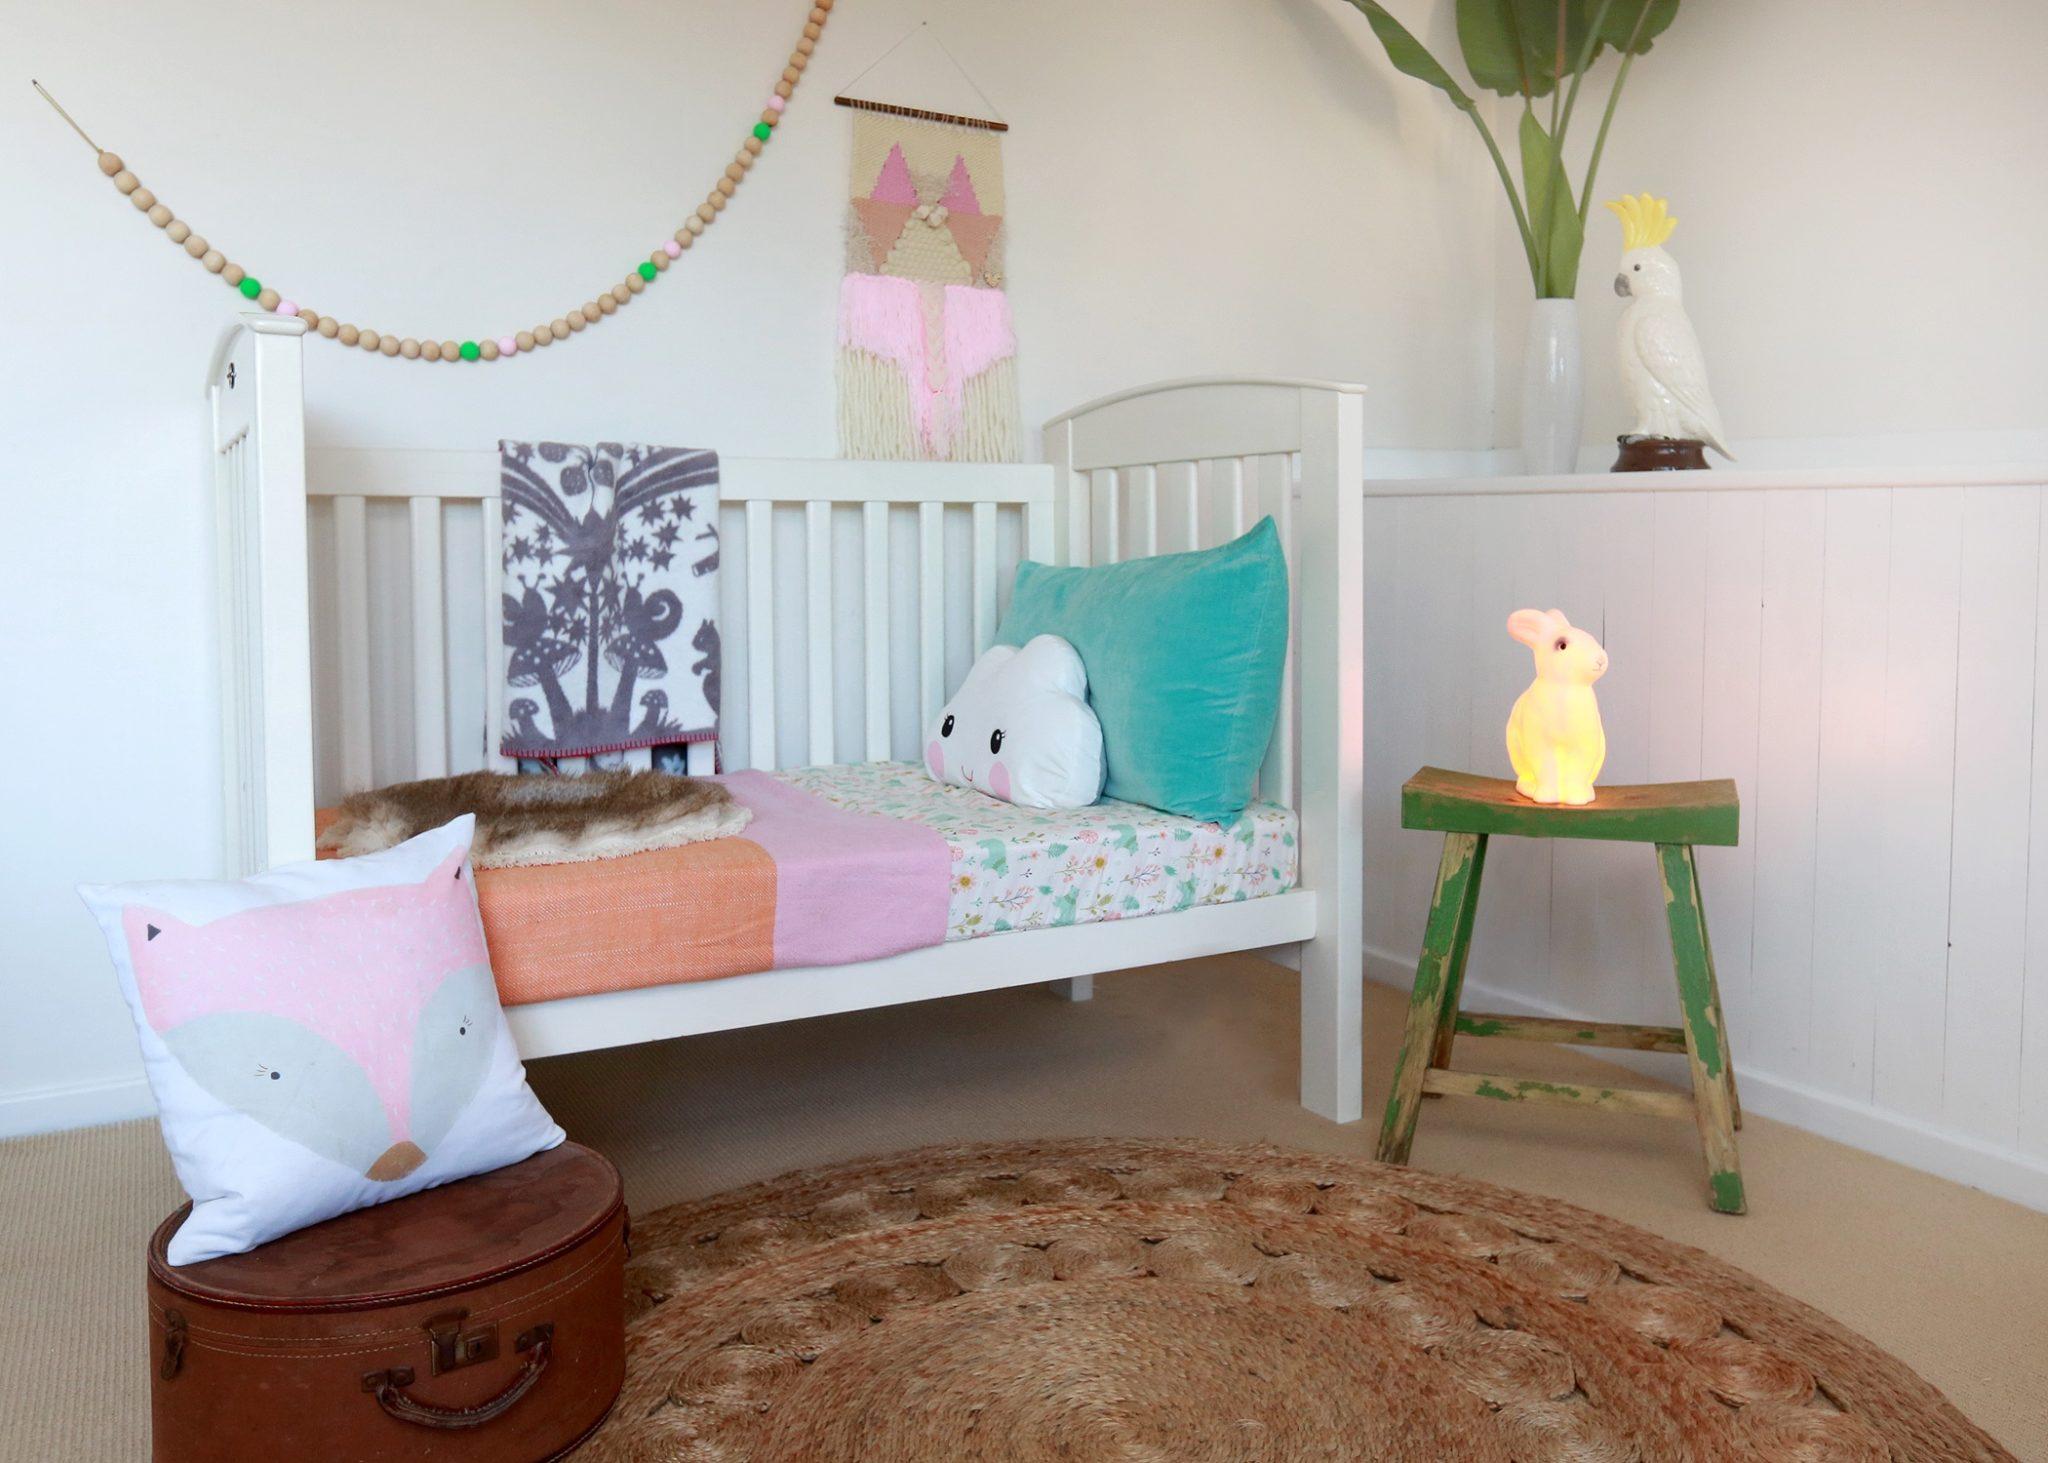 Girls woodland nursery, kids rooms inspiration